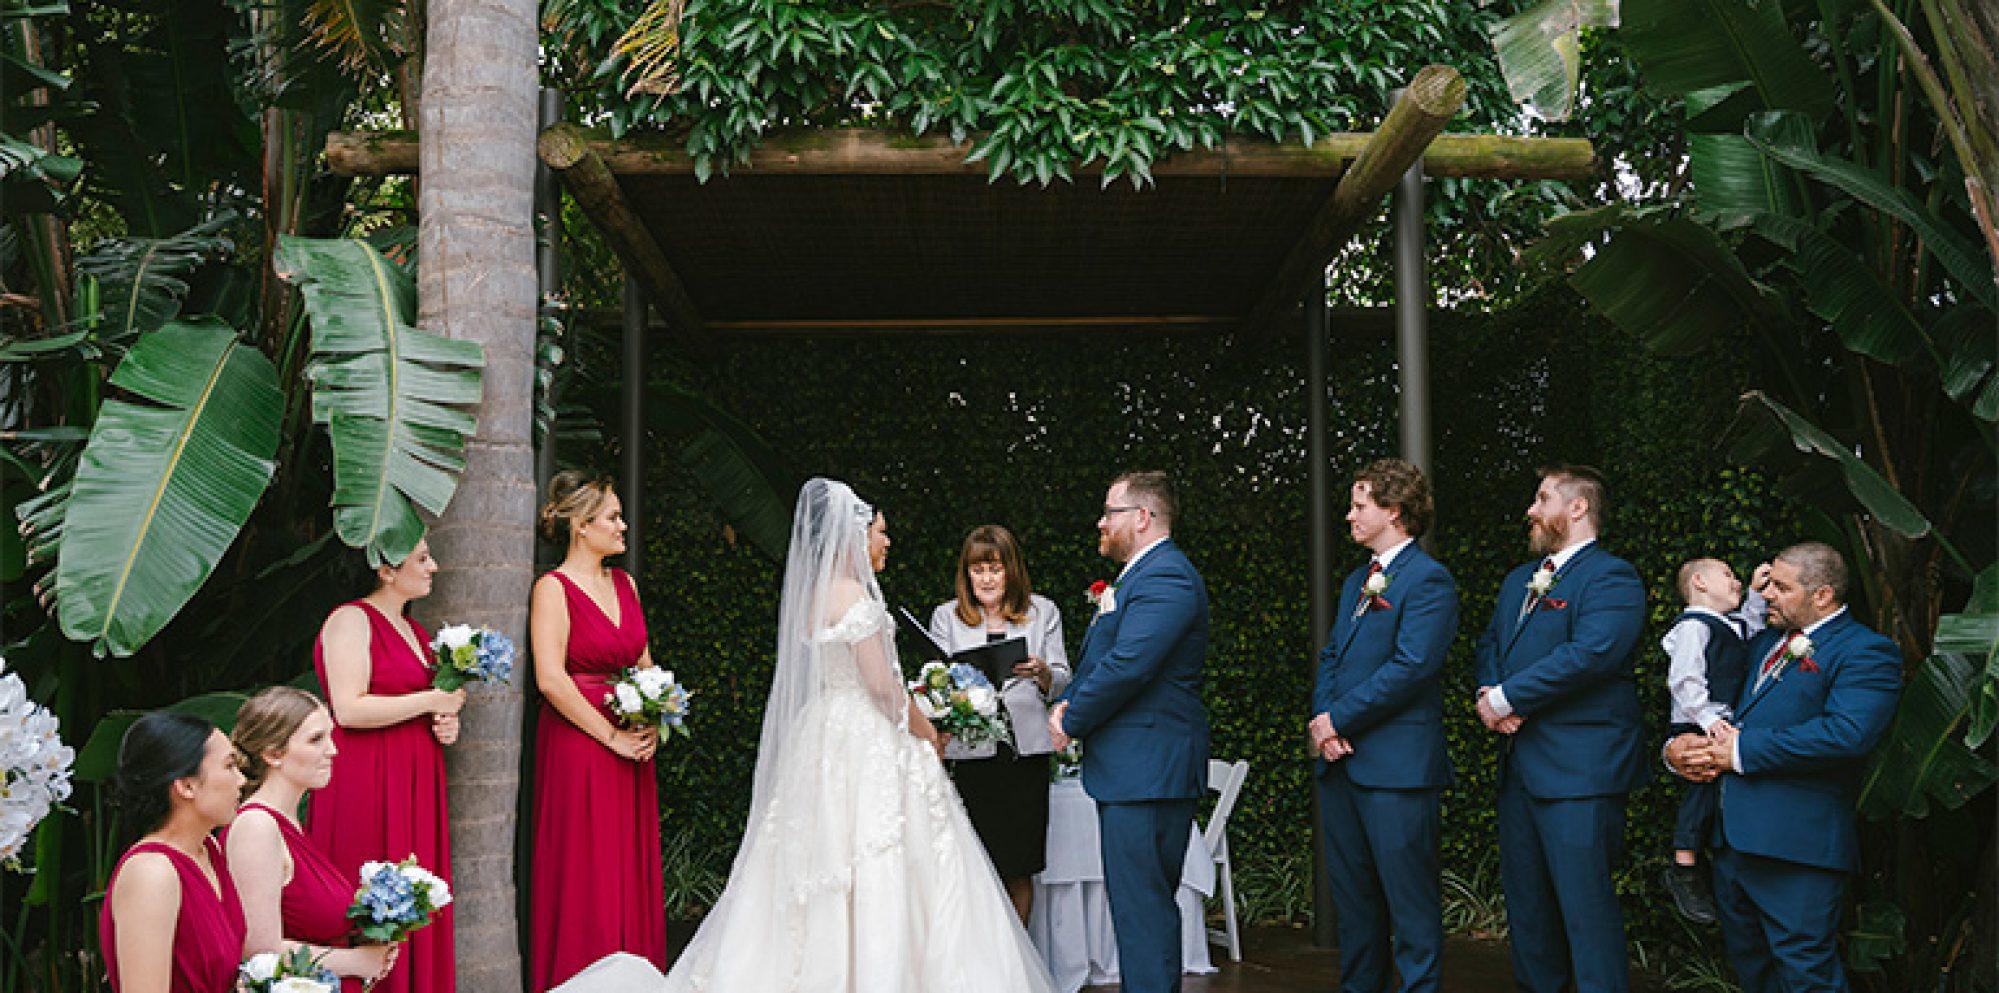 Nancy & russell wedding photography @ brighton savoy